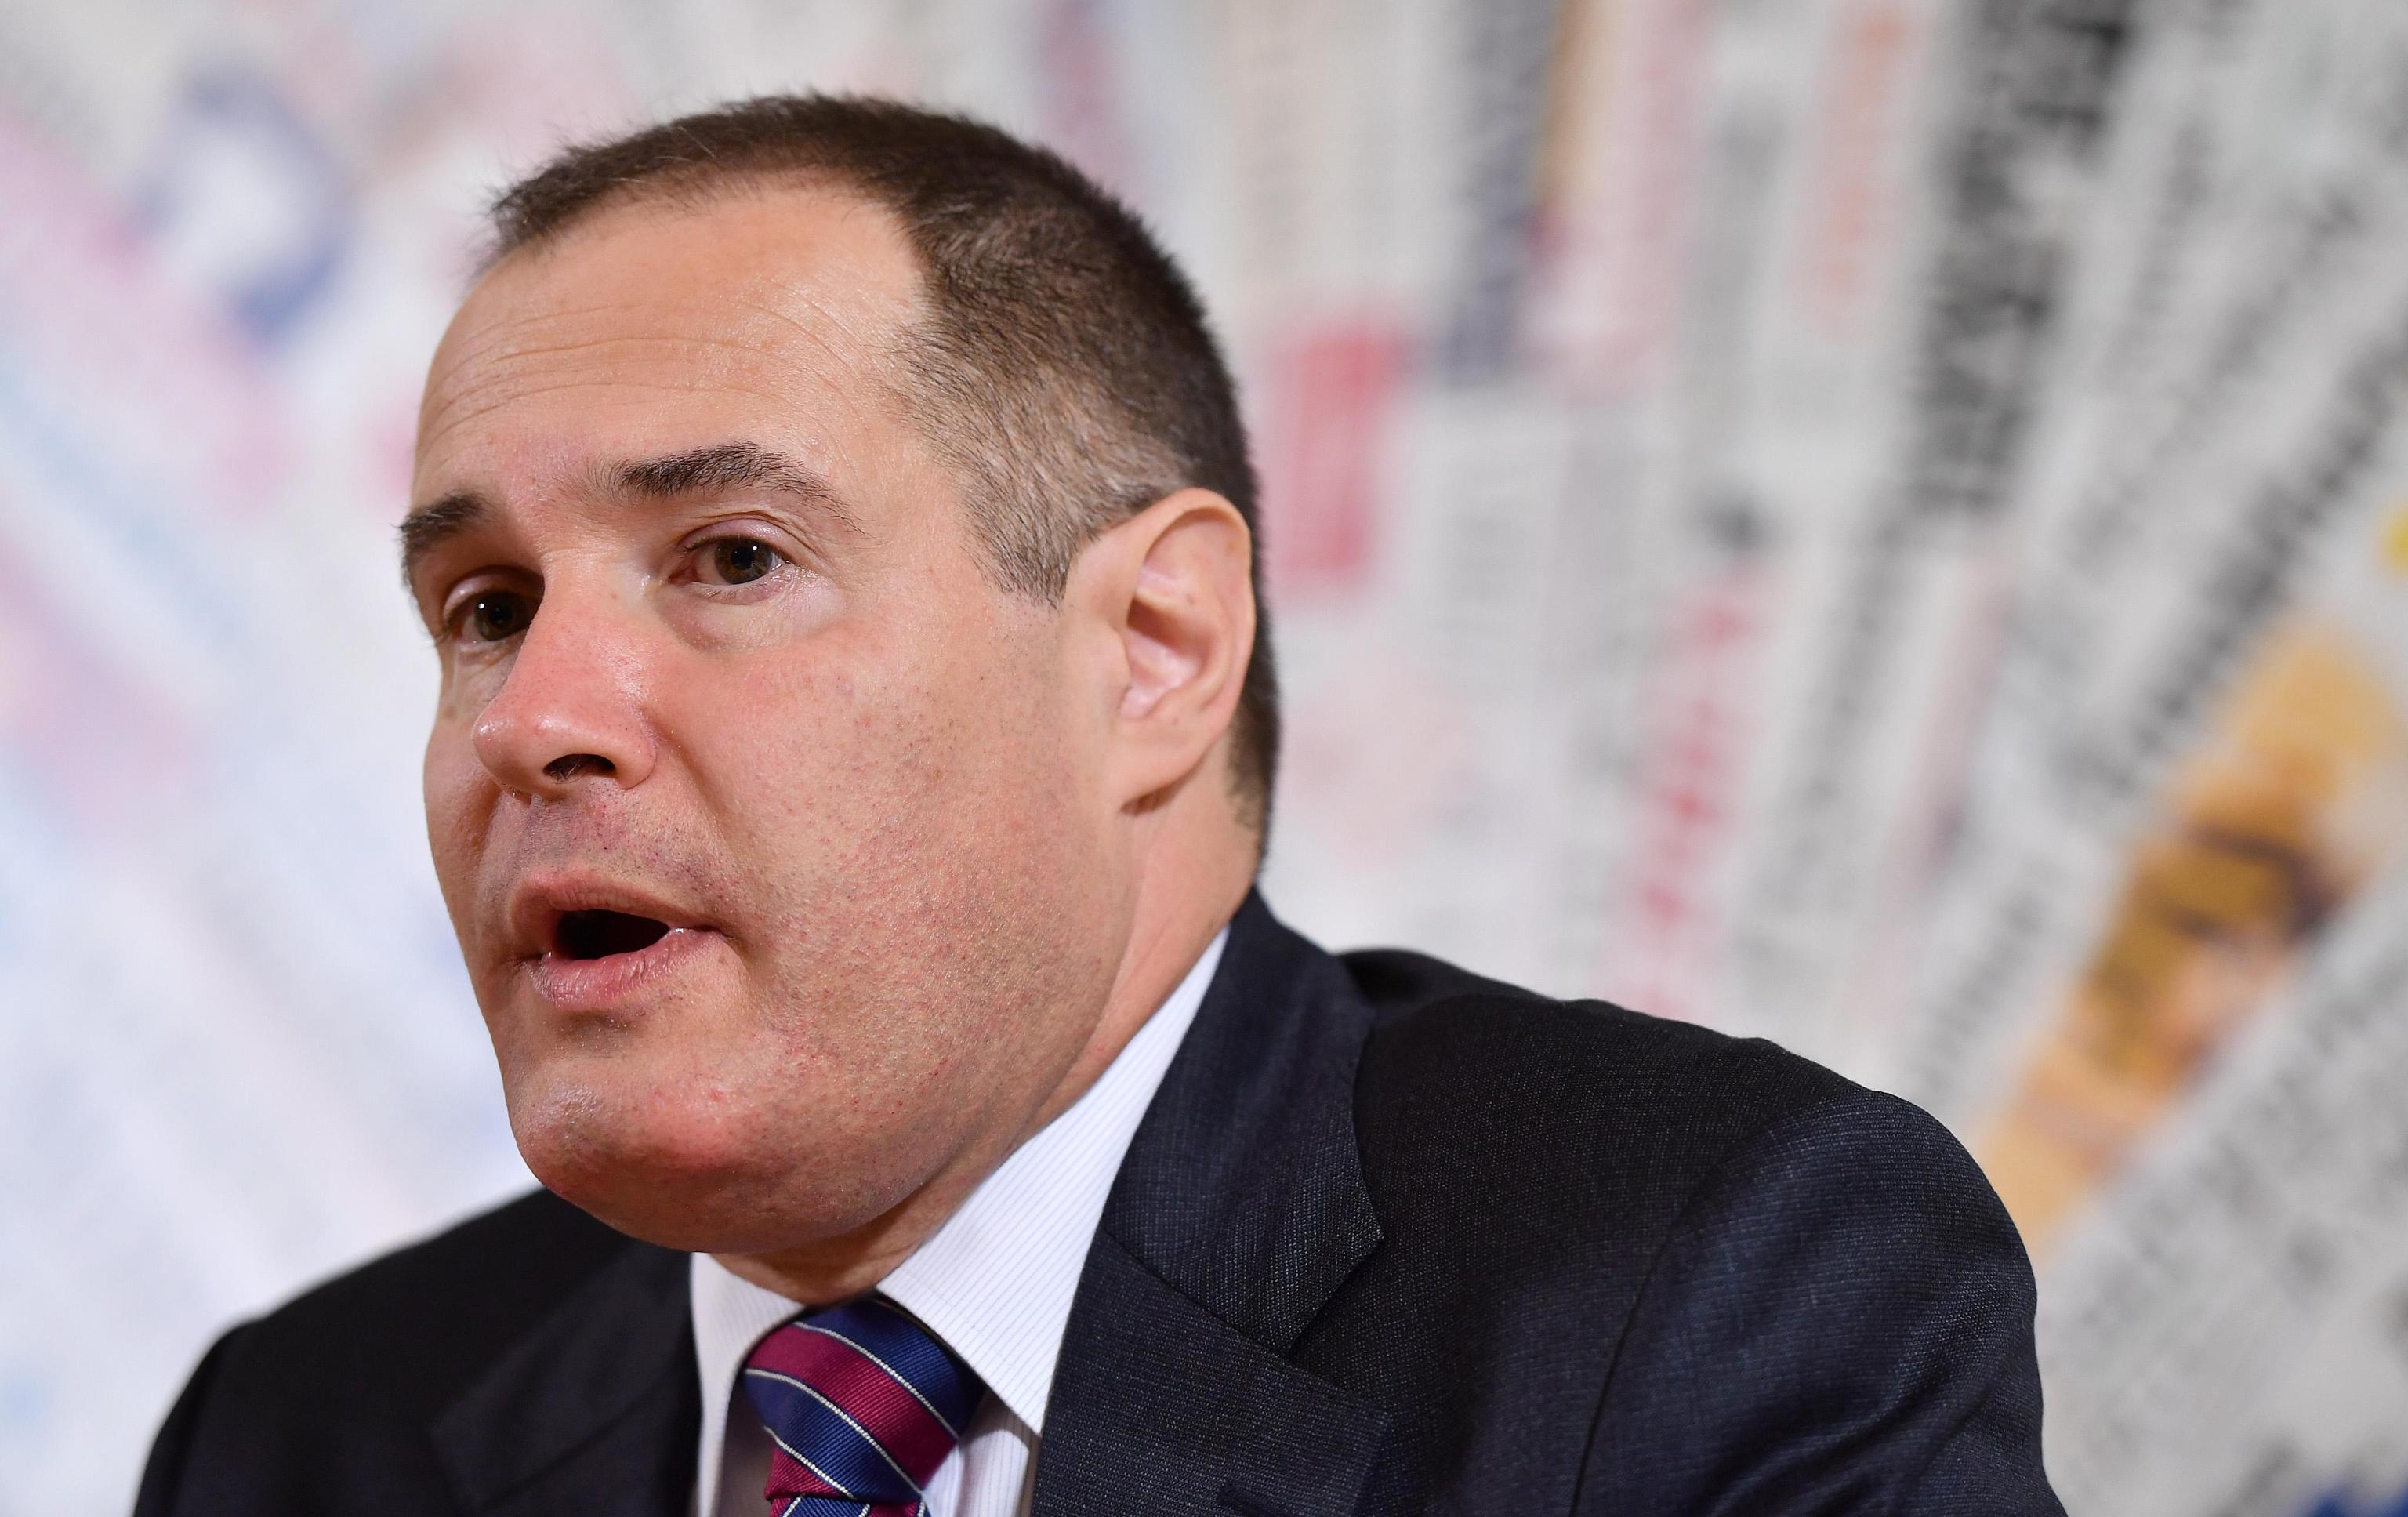 Fabrice Leggeri, French Director of Frontex